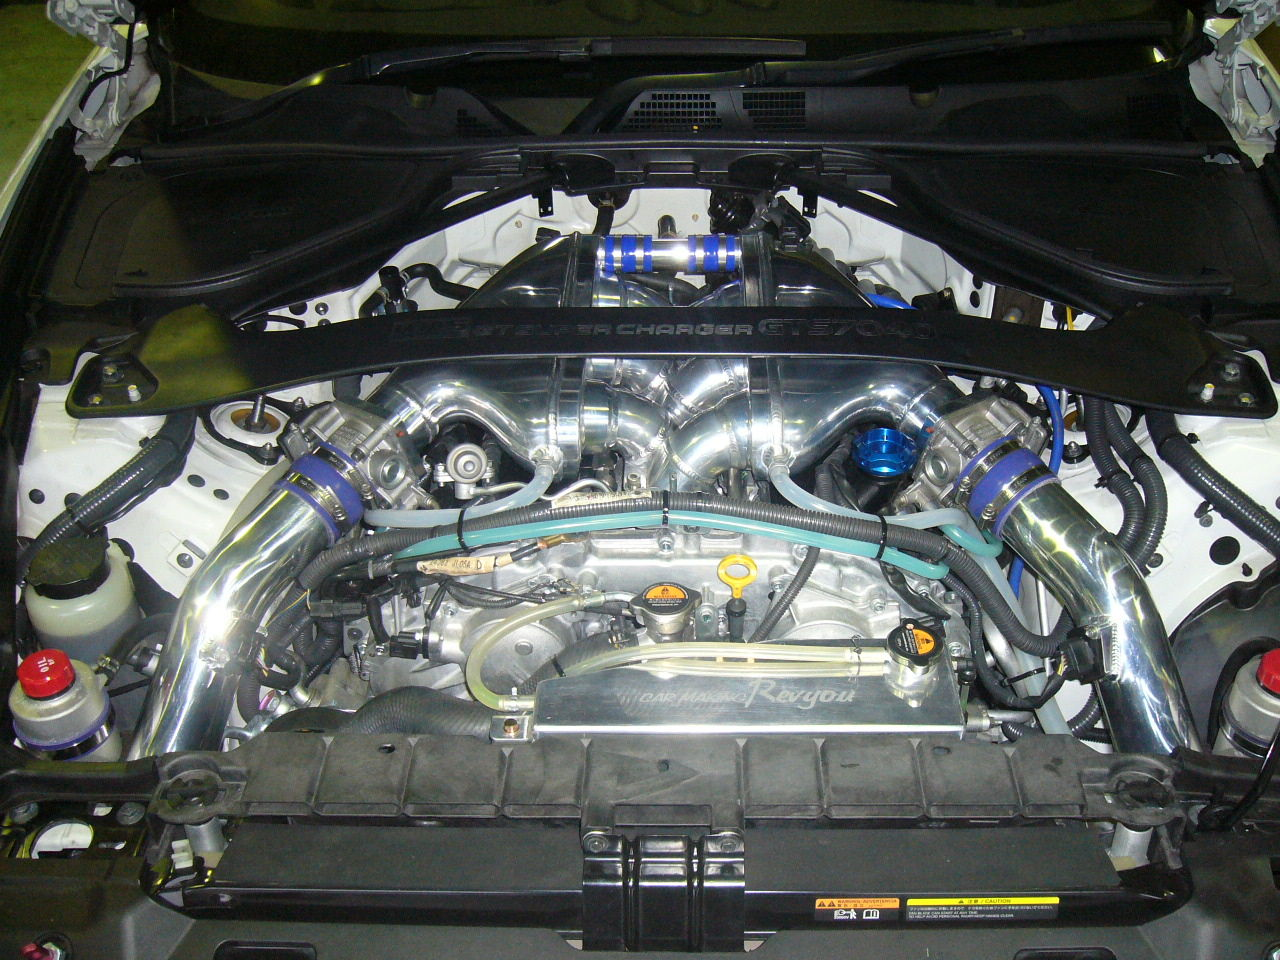 HKS supercharger - Page 2 - Nissan 370Z Forum